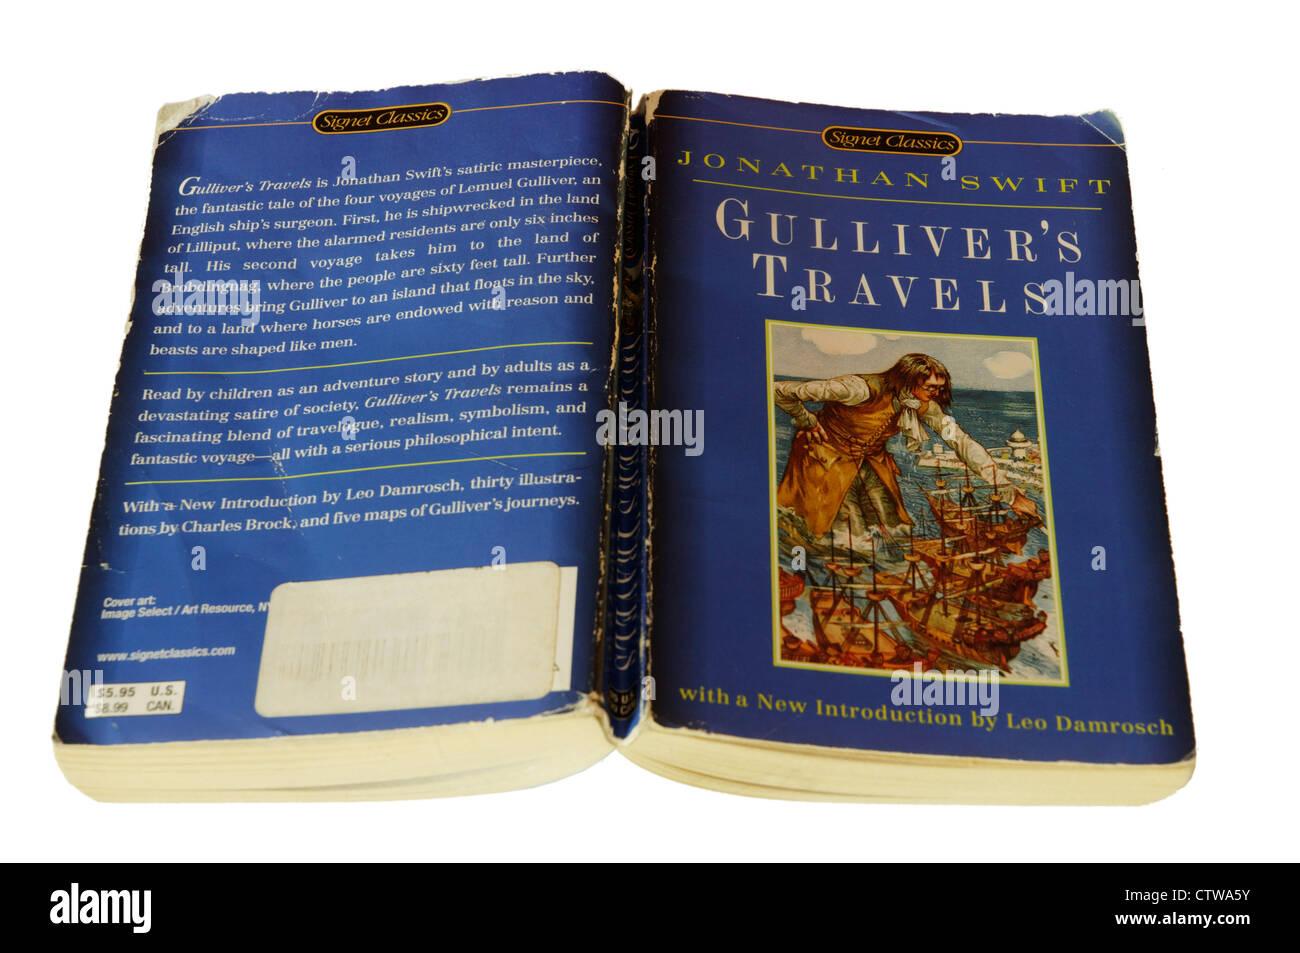 Gullivers Travels by Jonathan Swift - Stock Image